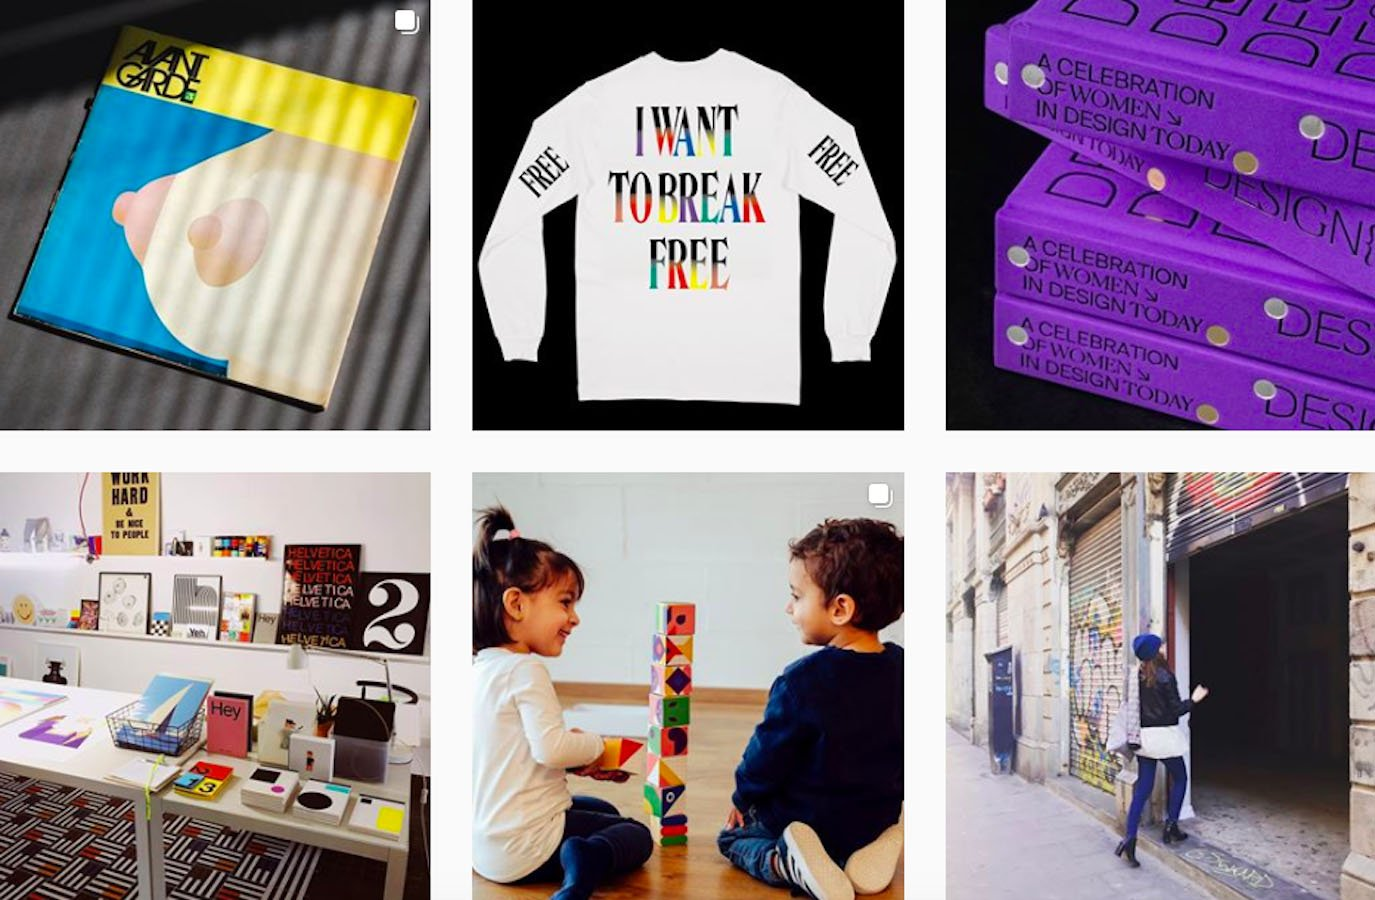 Web Design Inspiration: 110+ Accounts On Instagram and 10+ Best UX & Web Design Books in 2020 - heystudio